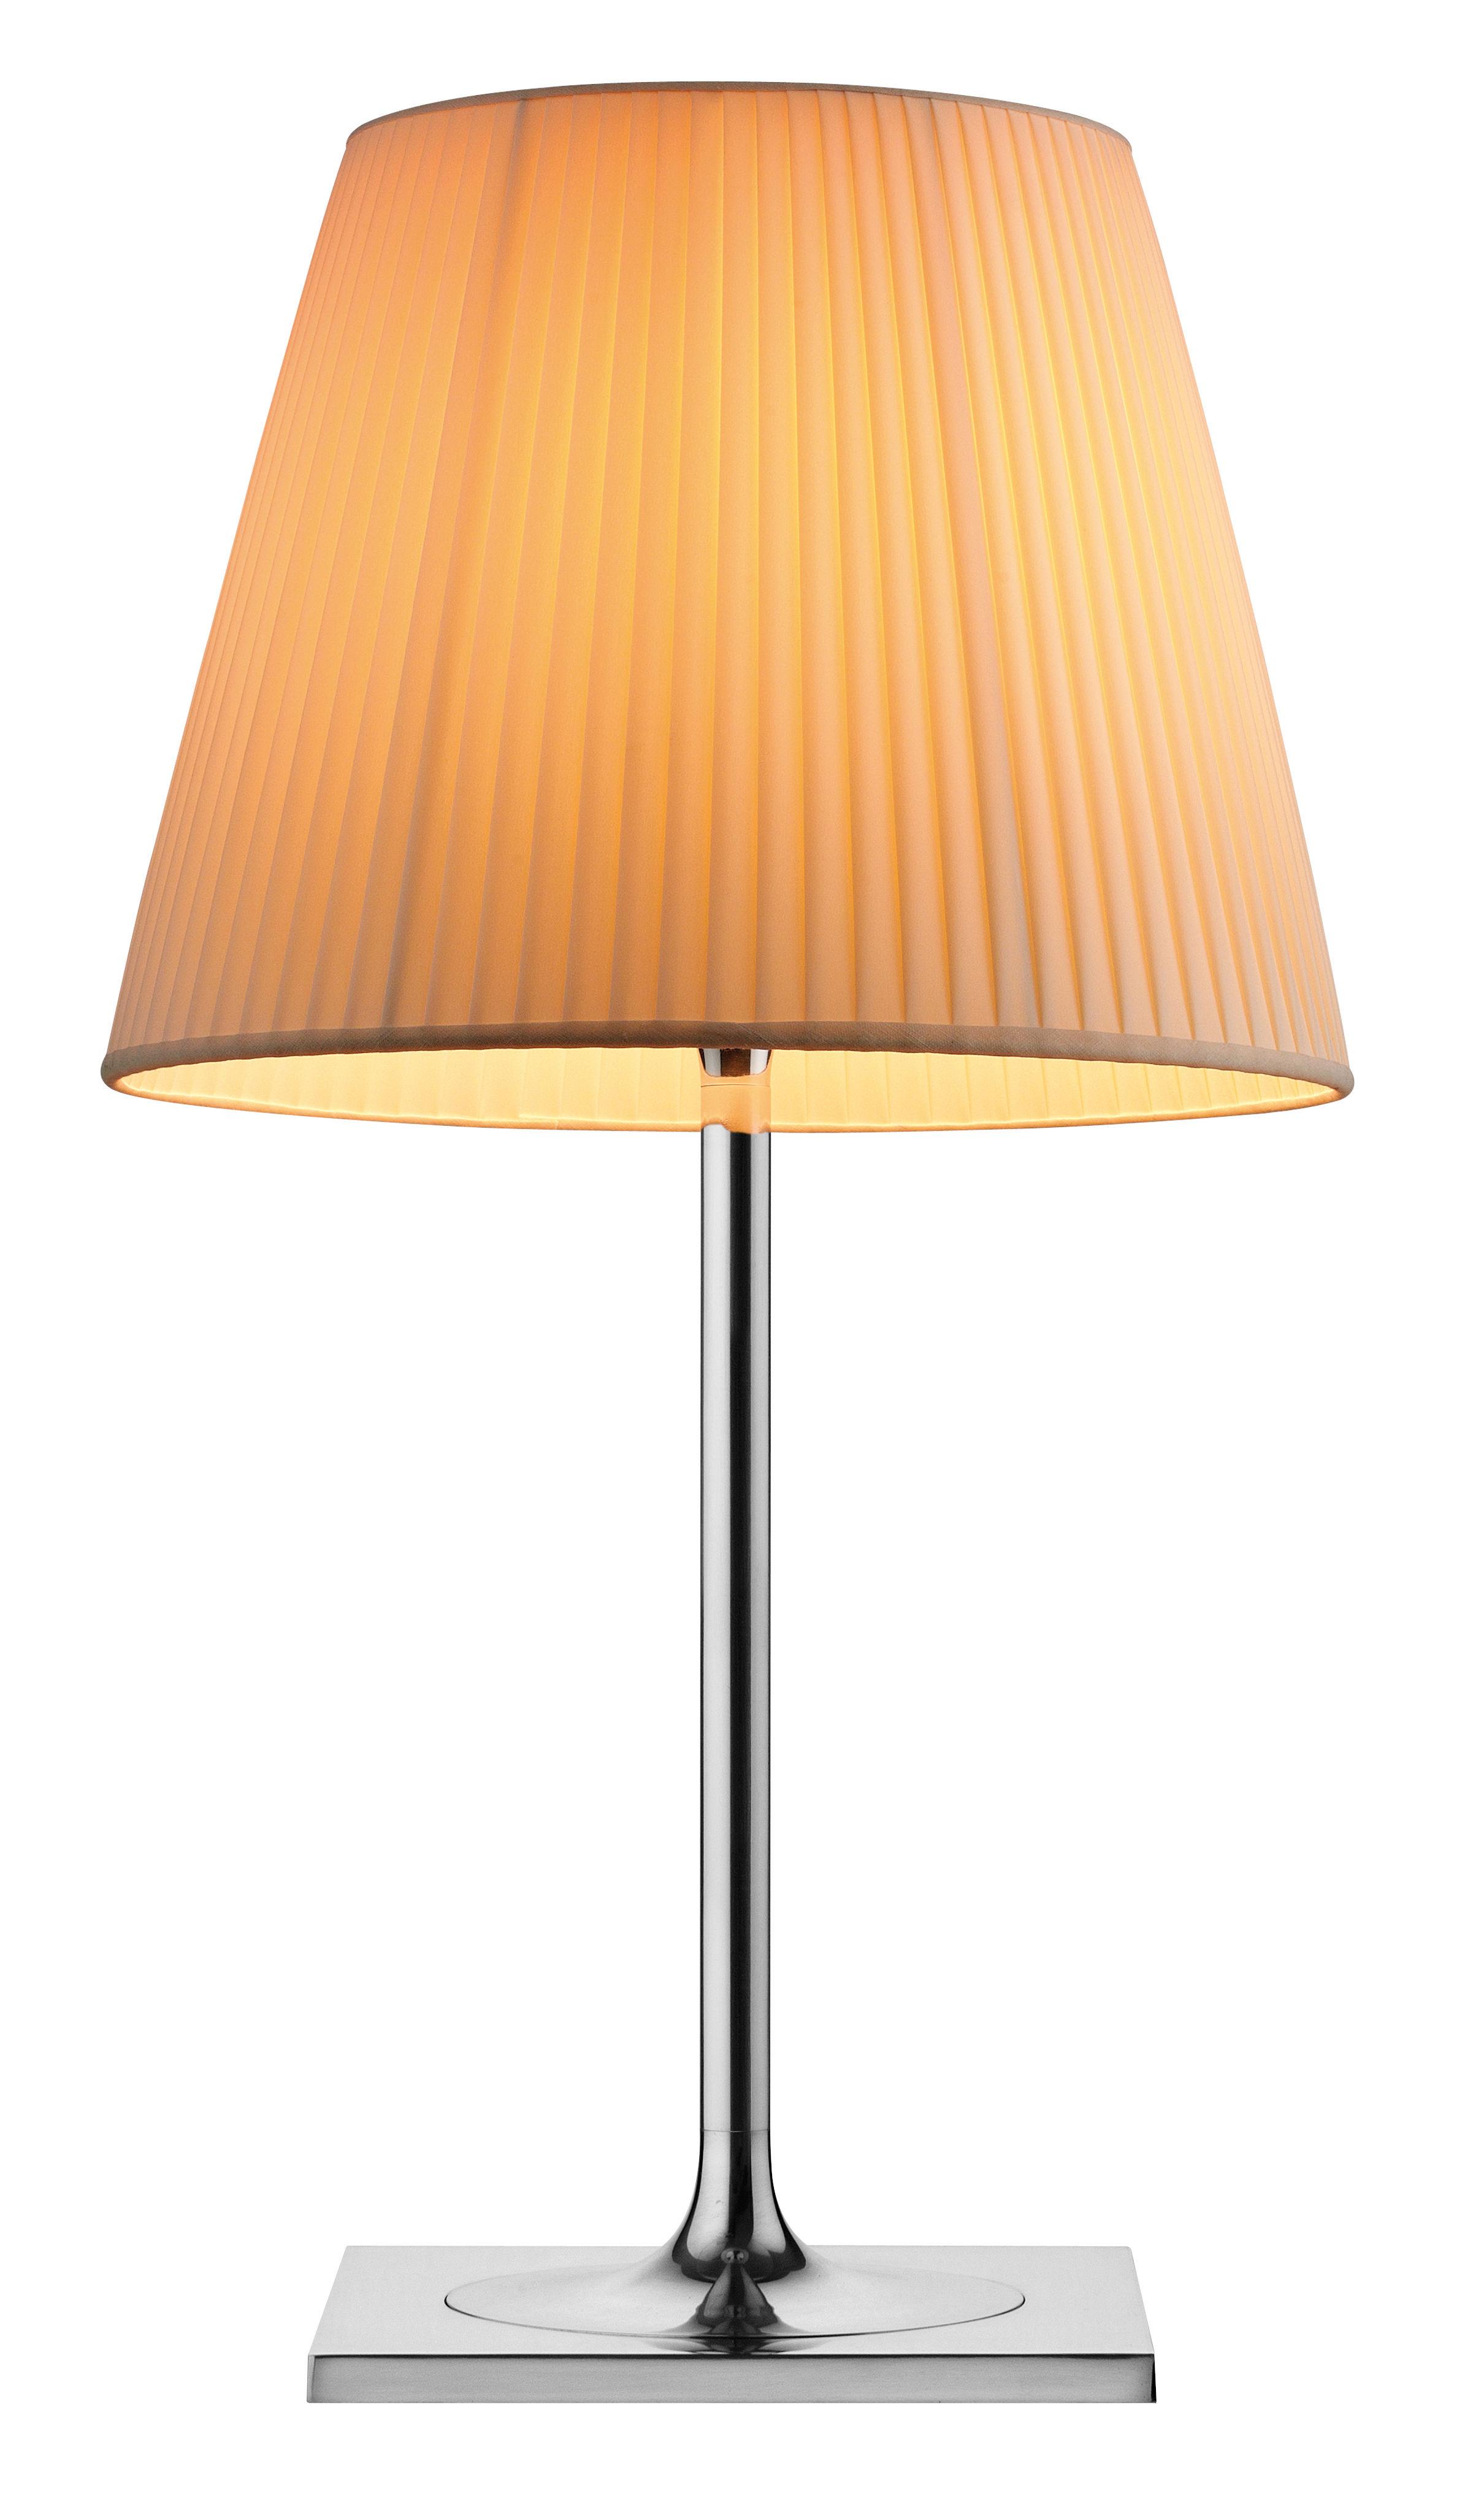 Luminaire - Lampes de table - Lampe de table K Tribe T2 Soft - Flos - Tissu plissé - Aluminium poli, Tissu